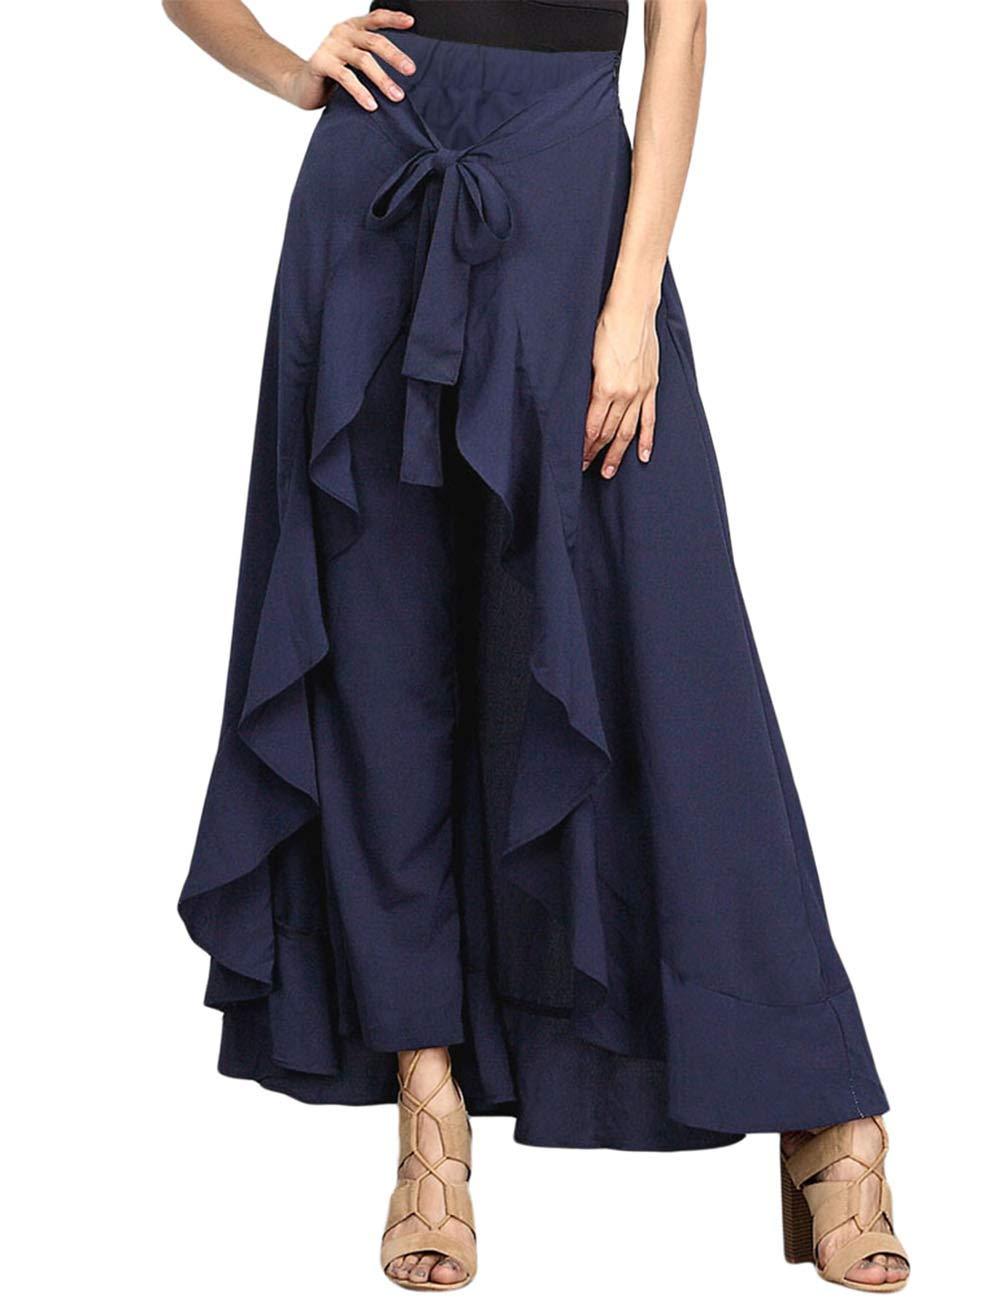 MuCoo Women's Solid Ruffle Wide Leg Tie-Waist Palazzo Pant Overlay Maxi Skirts Muc-CA-LC77034